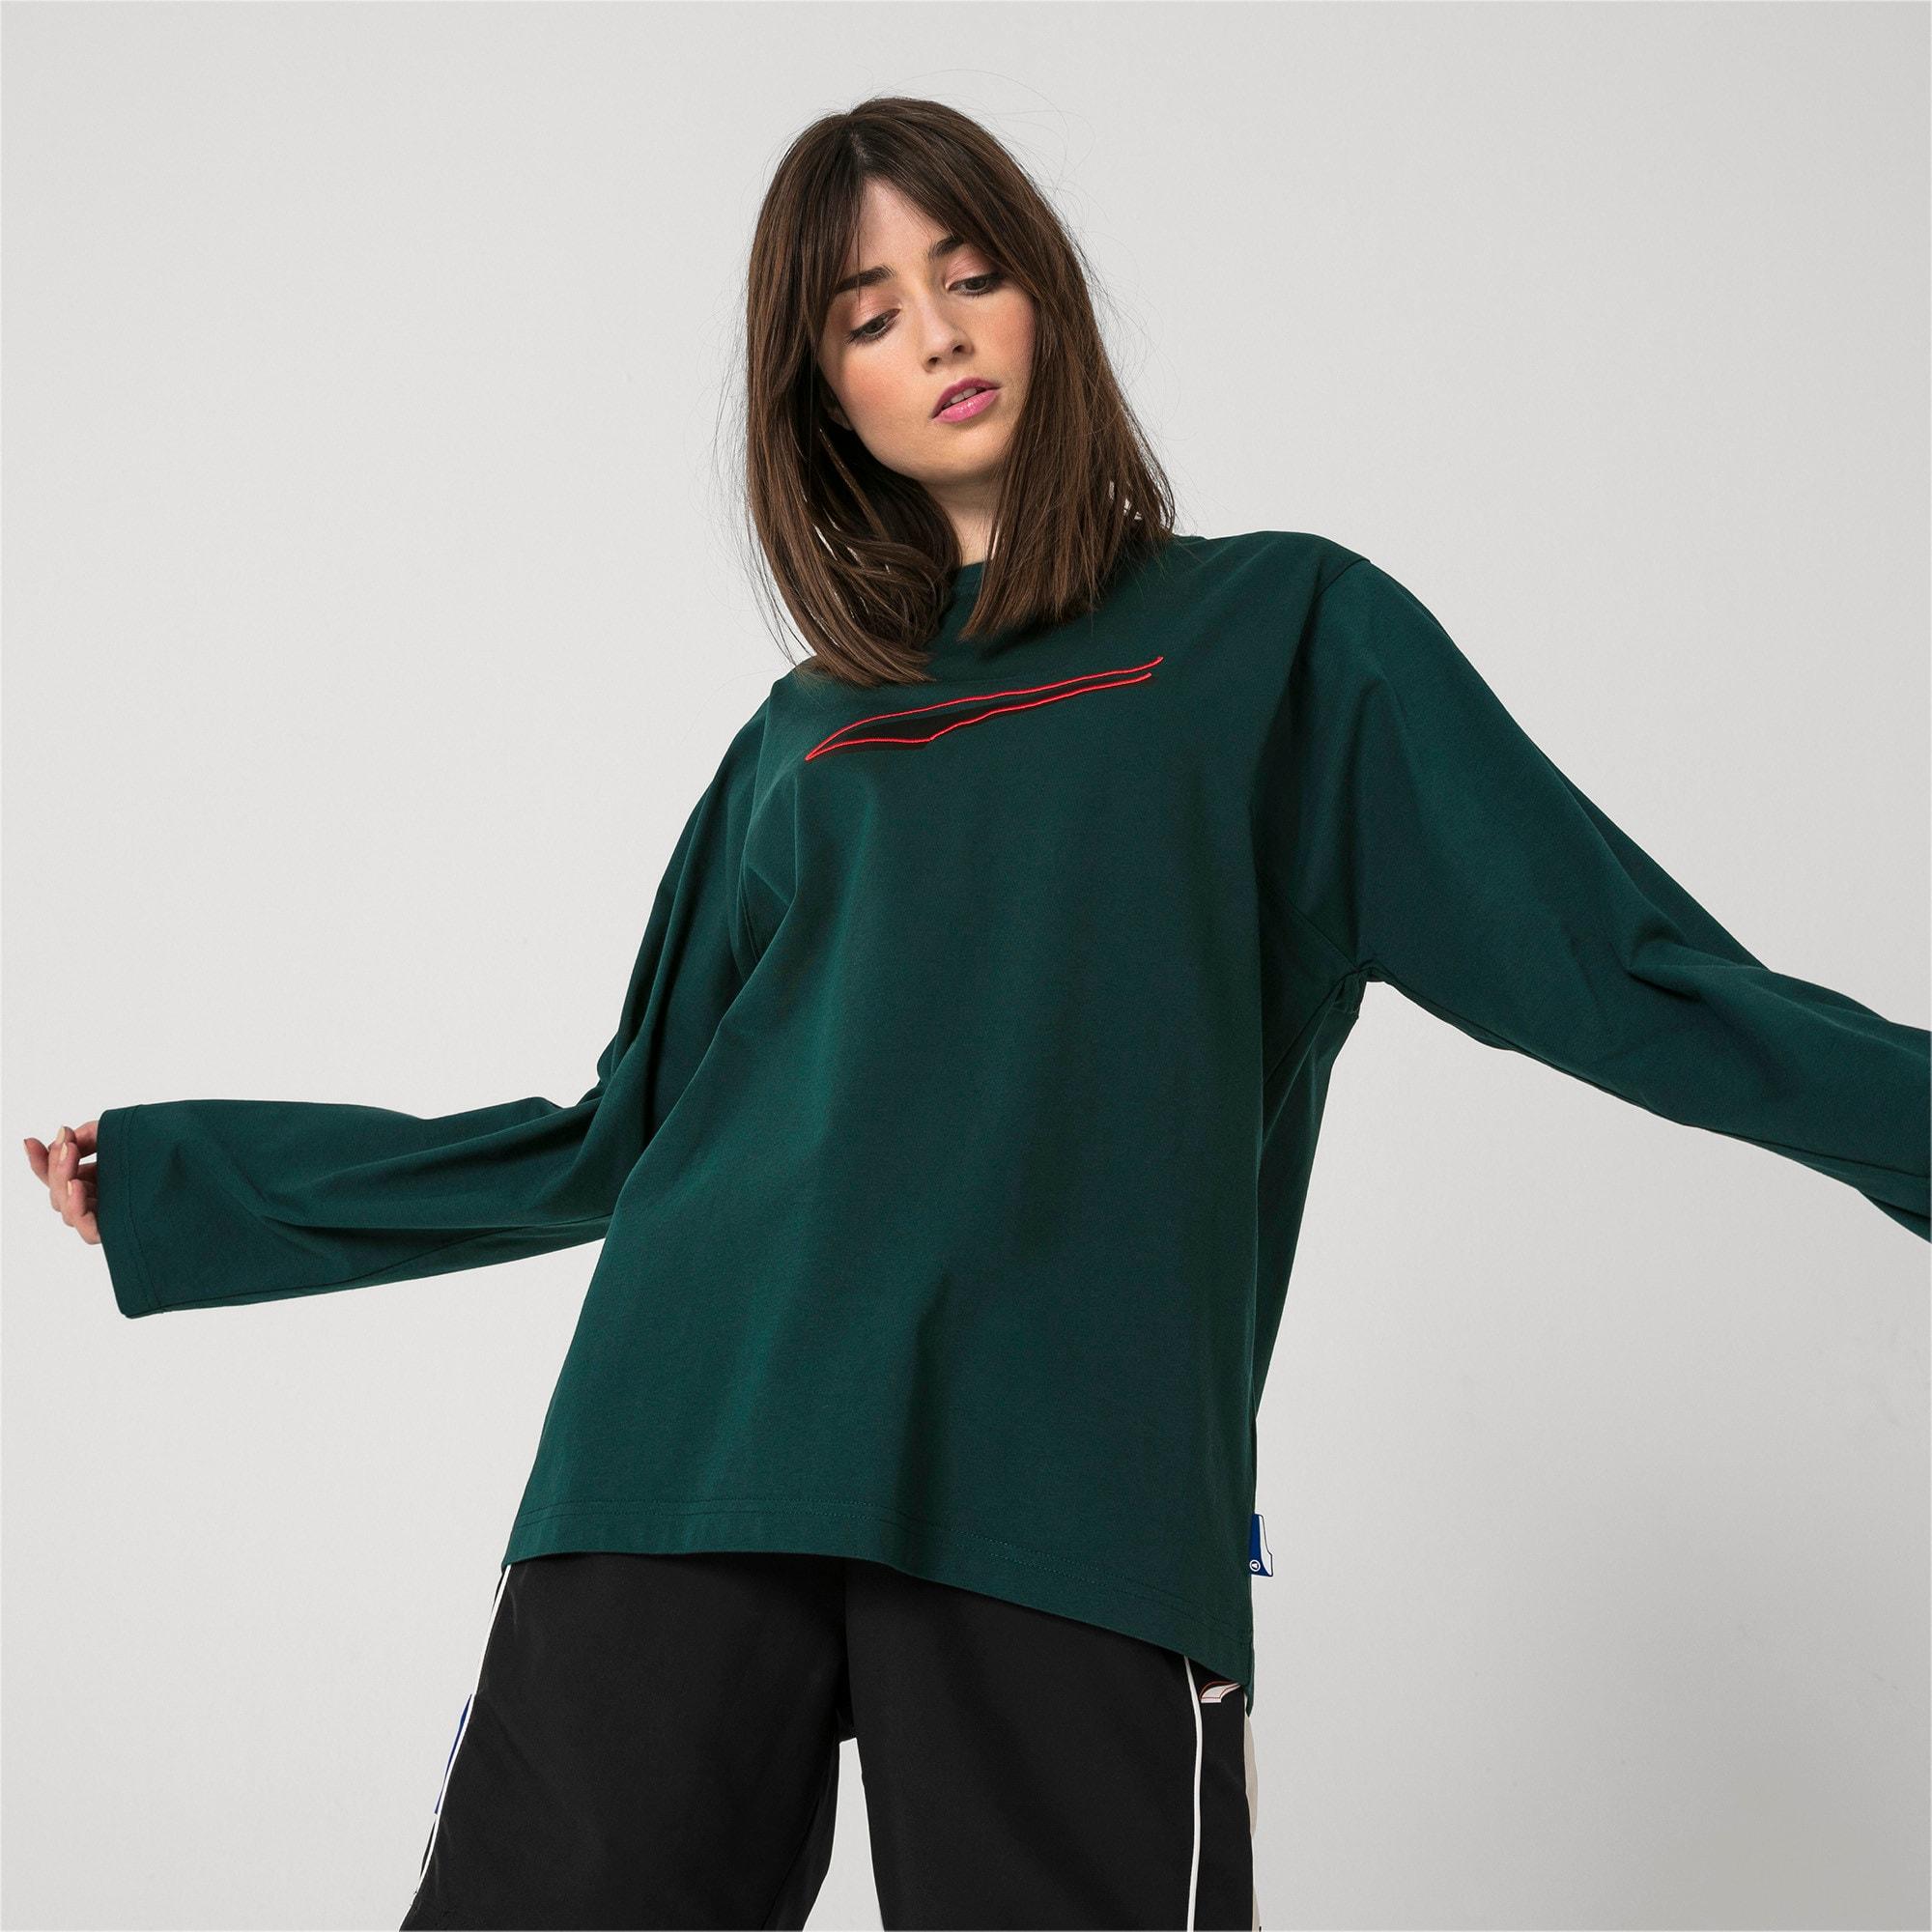 Thumbnail 6 of PUMA x ADER ERROR Langarm-Shirt, Ponderosa Pine, medium